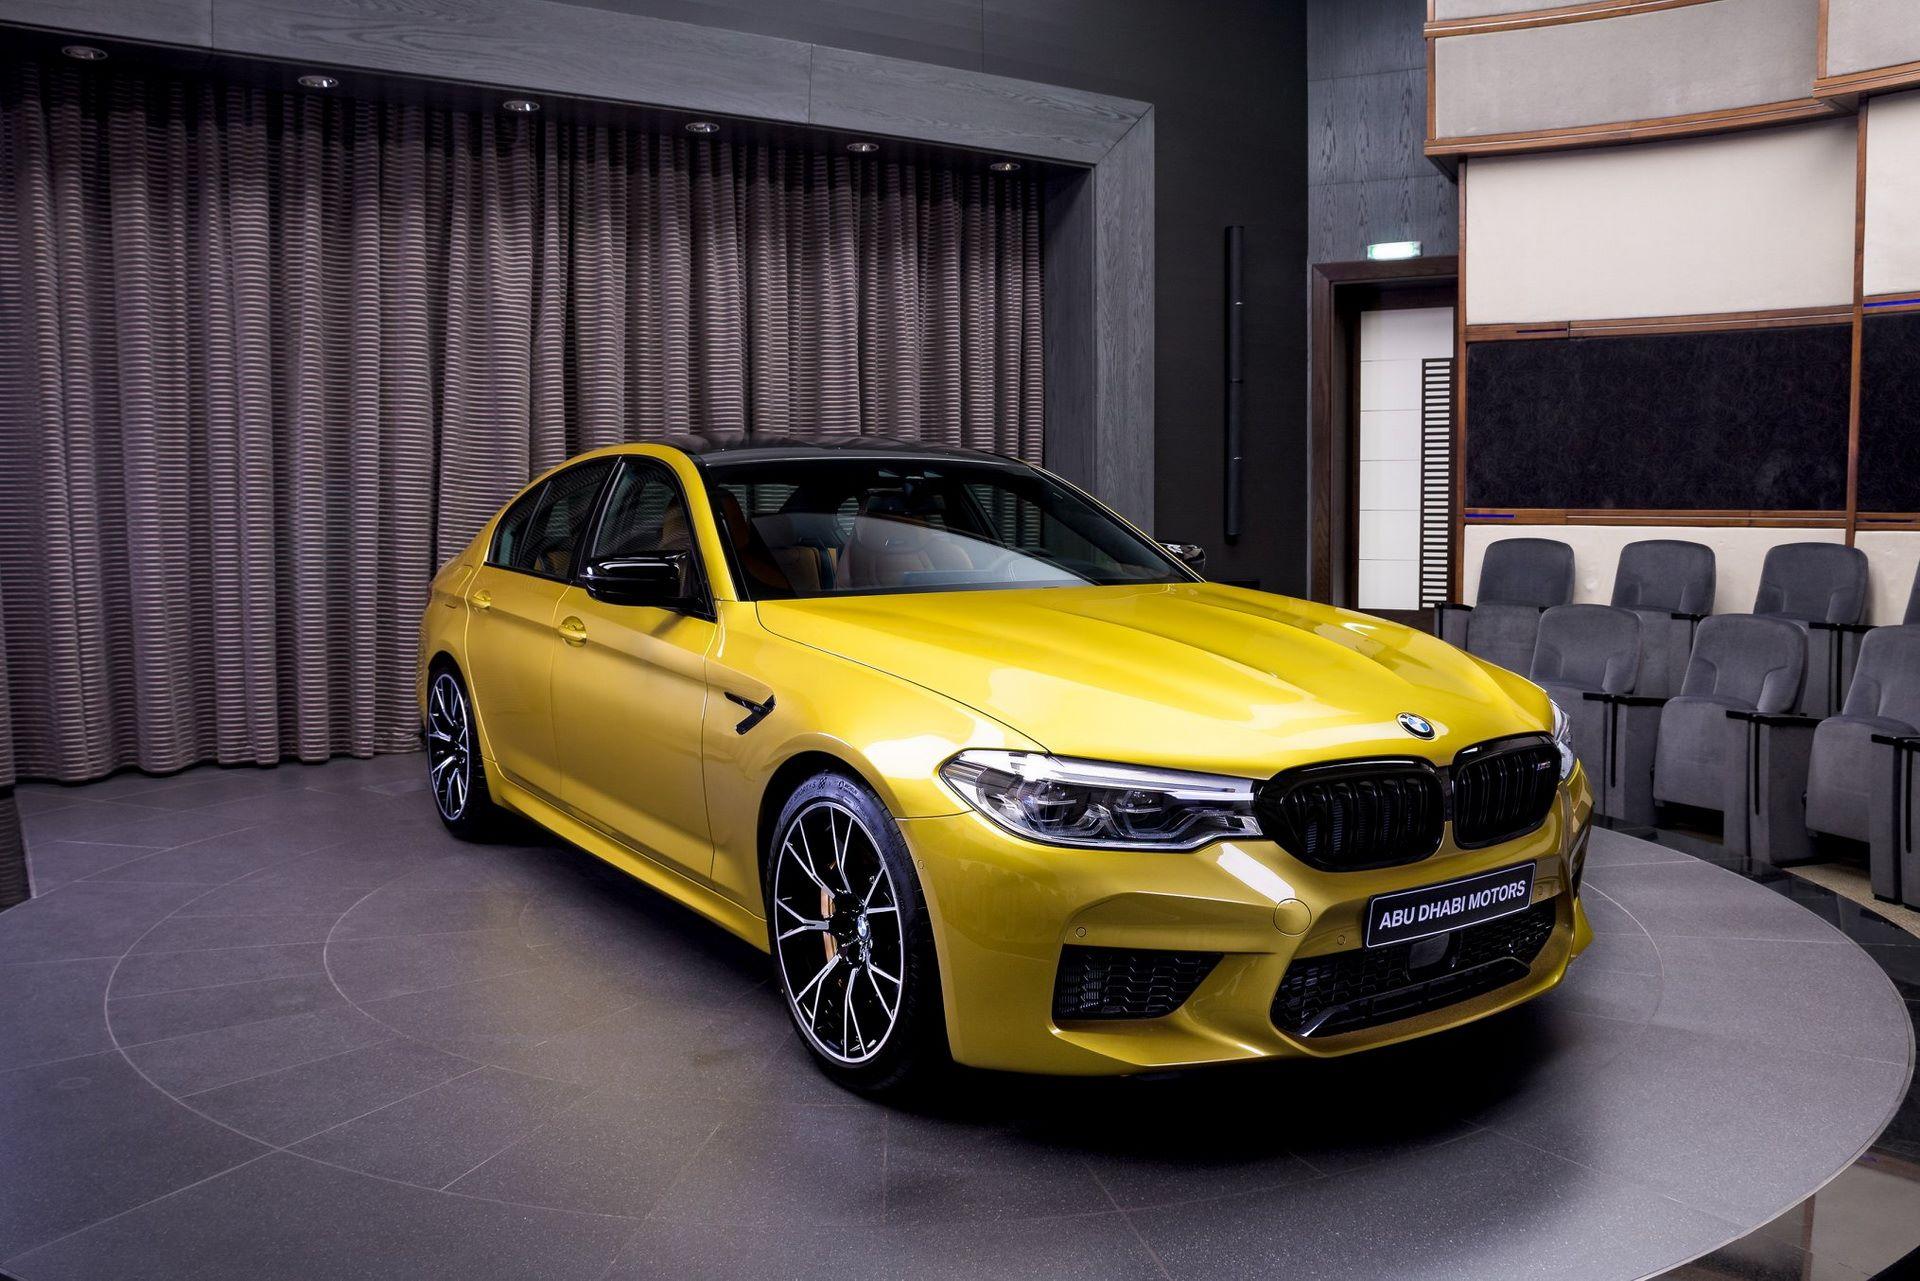 BMW-M5-Competition-Austin-Yellow-Abu-Dhabi-Motors-1